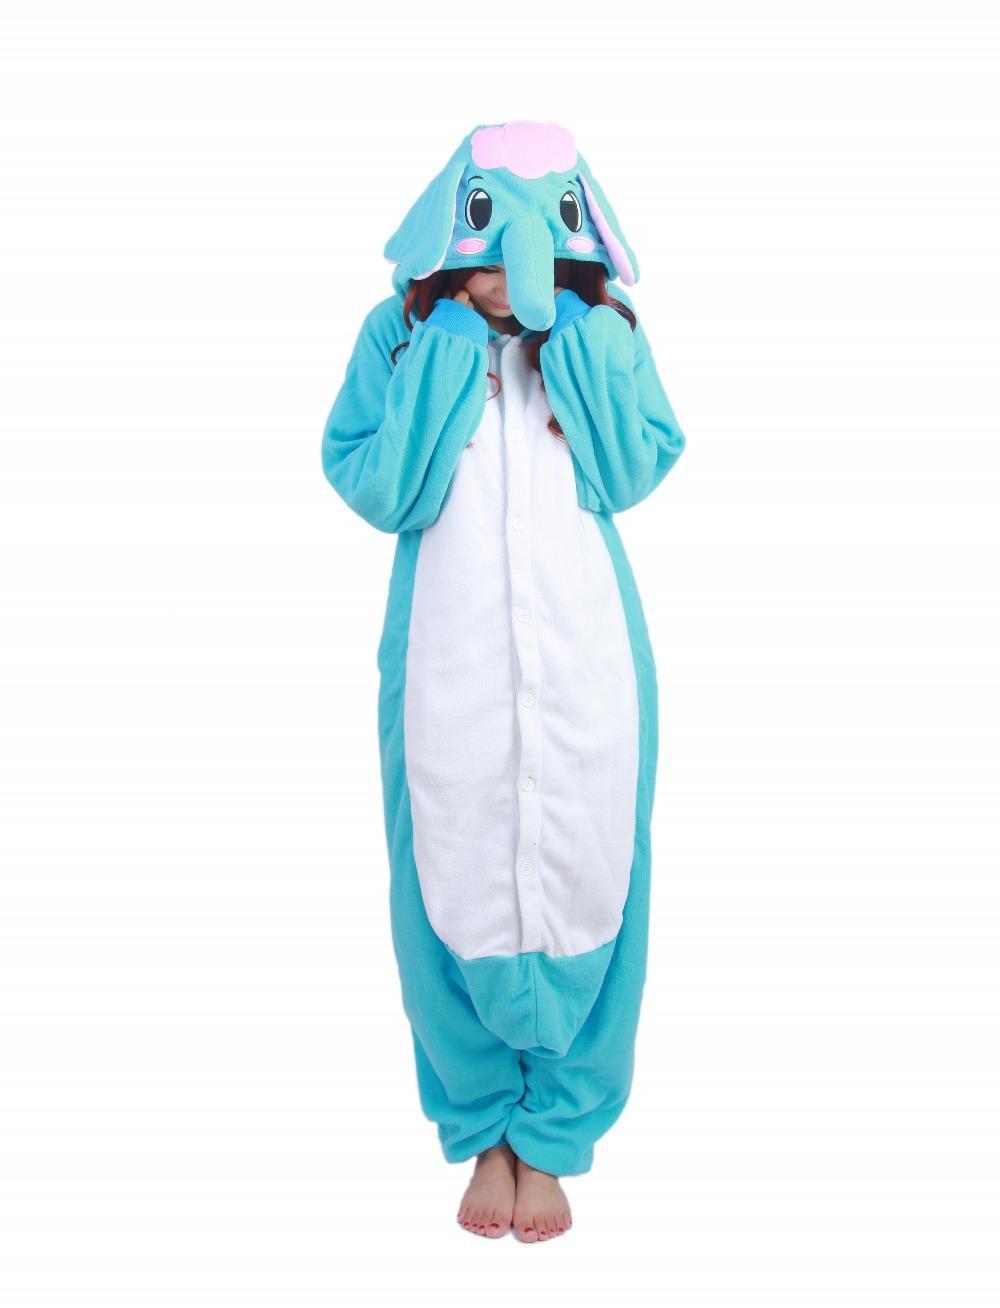 New Design Pyjamas Adult Animal Onesie Lovely Elephant Pajamas Sleepsuit For Unisex